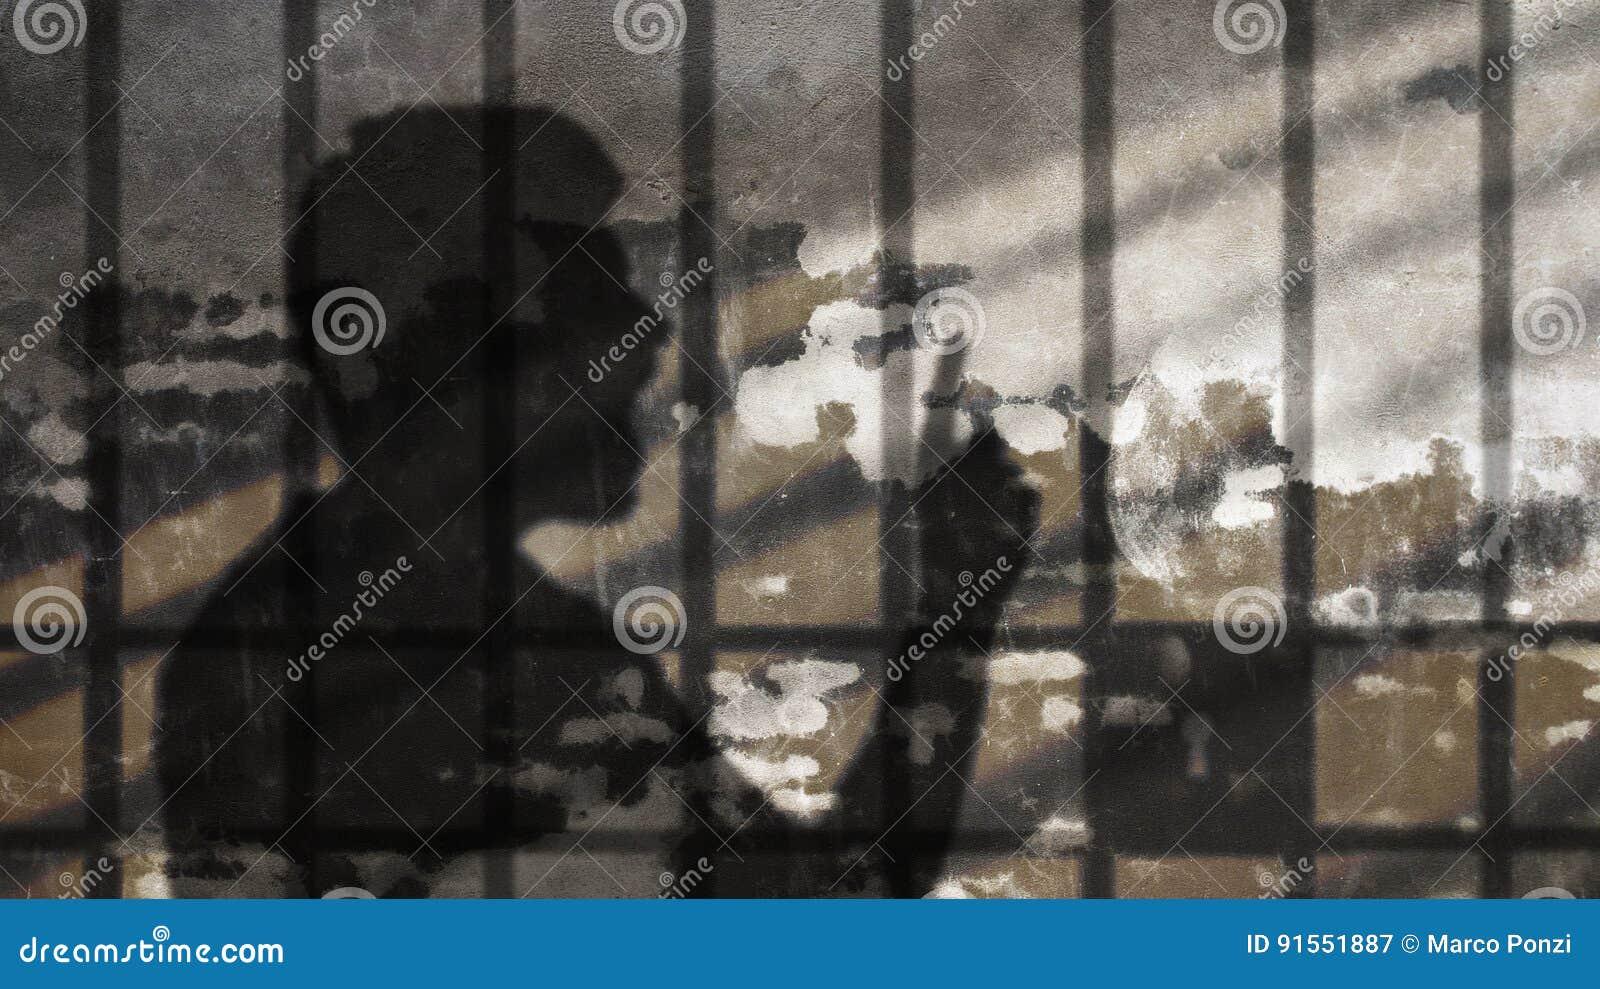 Man Shadow Talking Under Jail Bars.